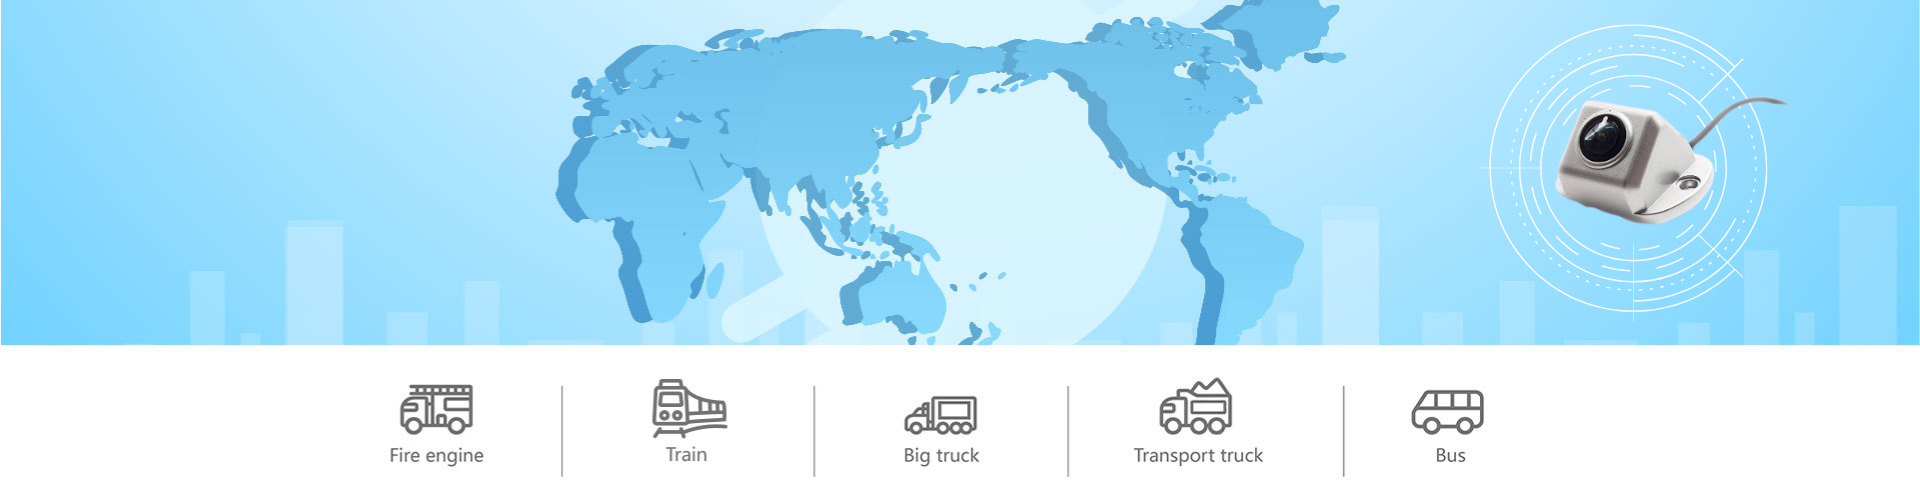 Truck Camera System Banner